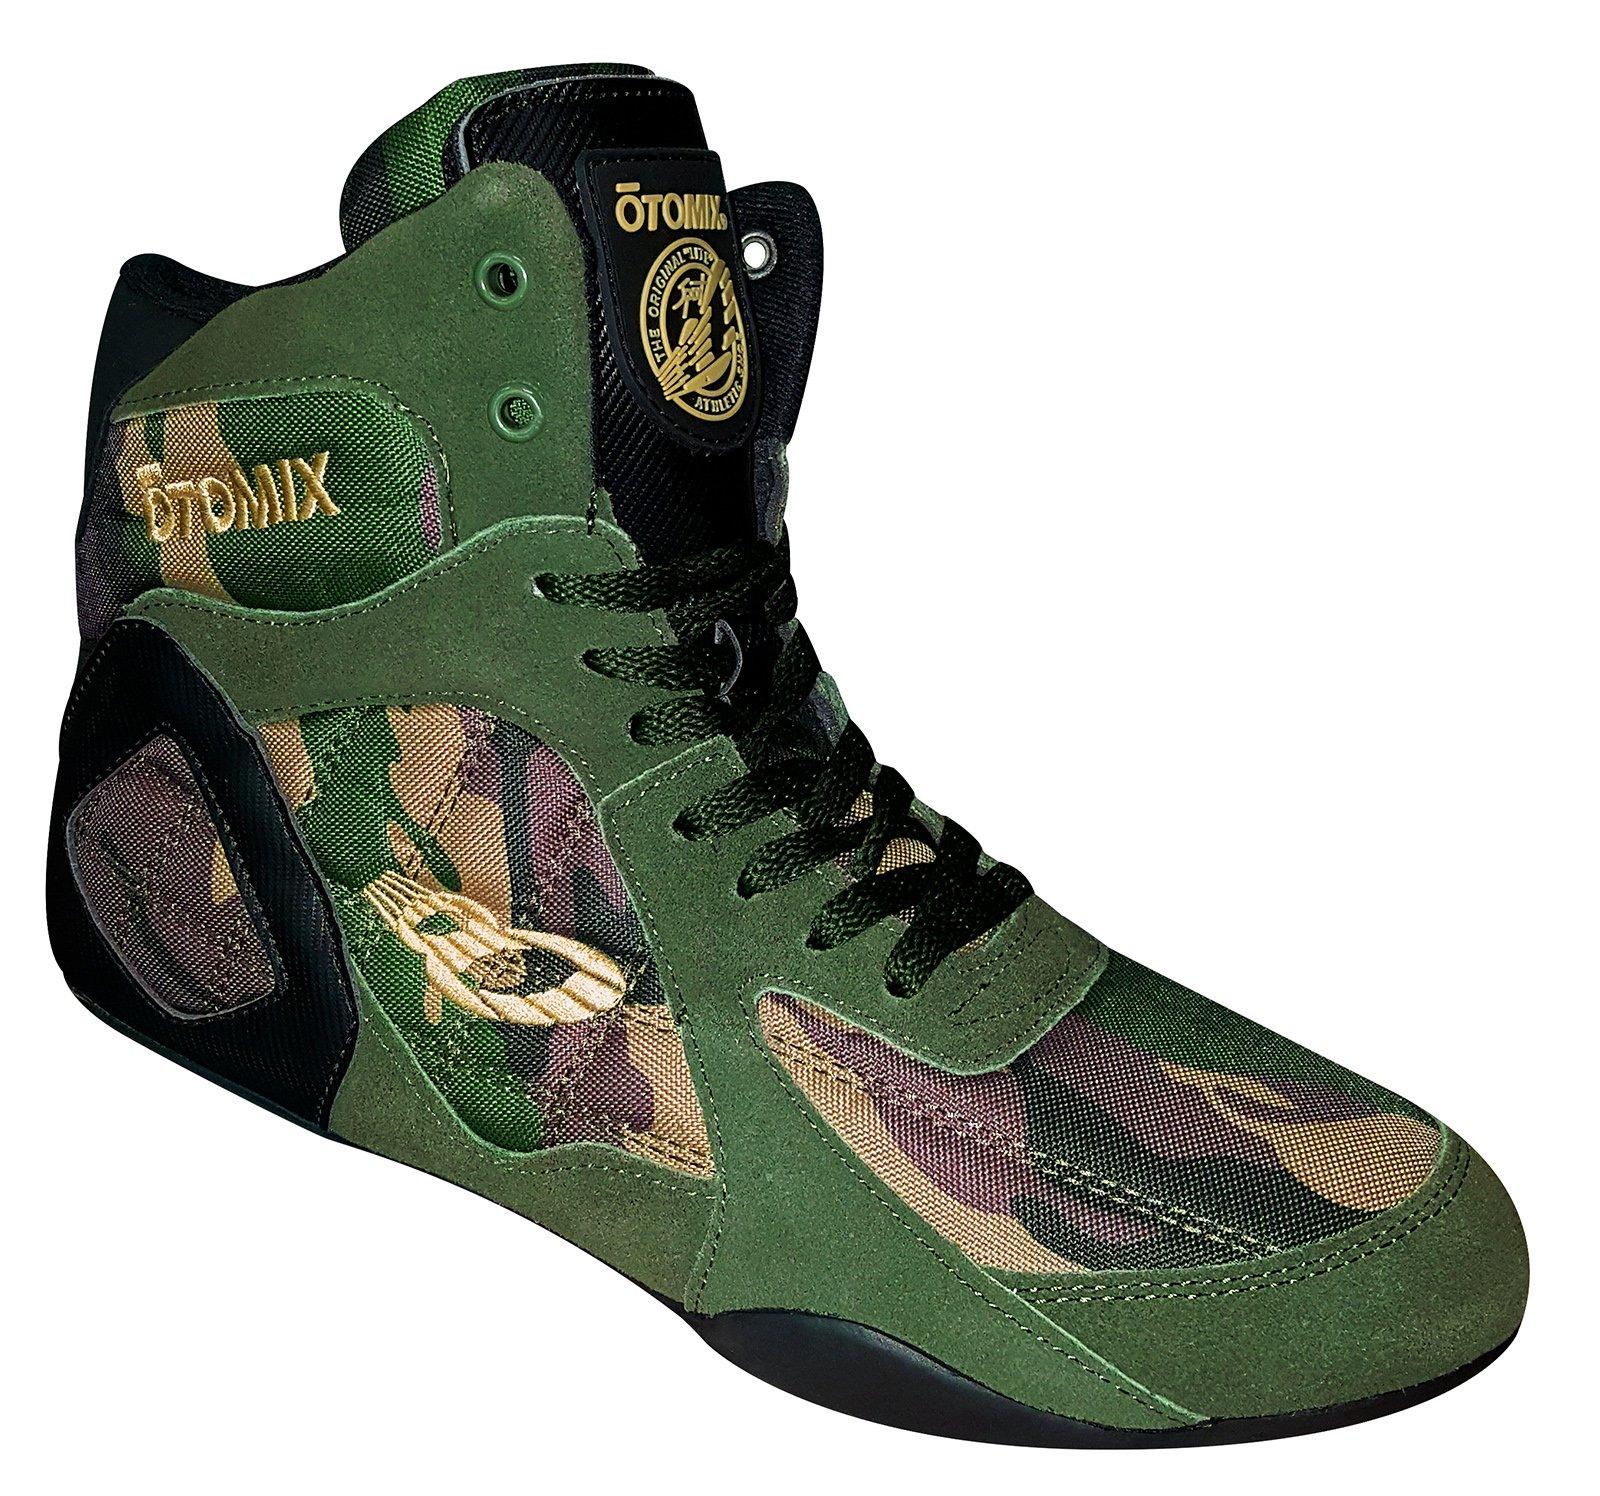 Otomix Ninja Warrior Stingray Bodybuilding Combat Shoe Women's (7, Camo)